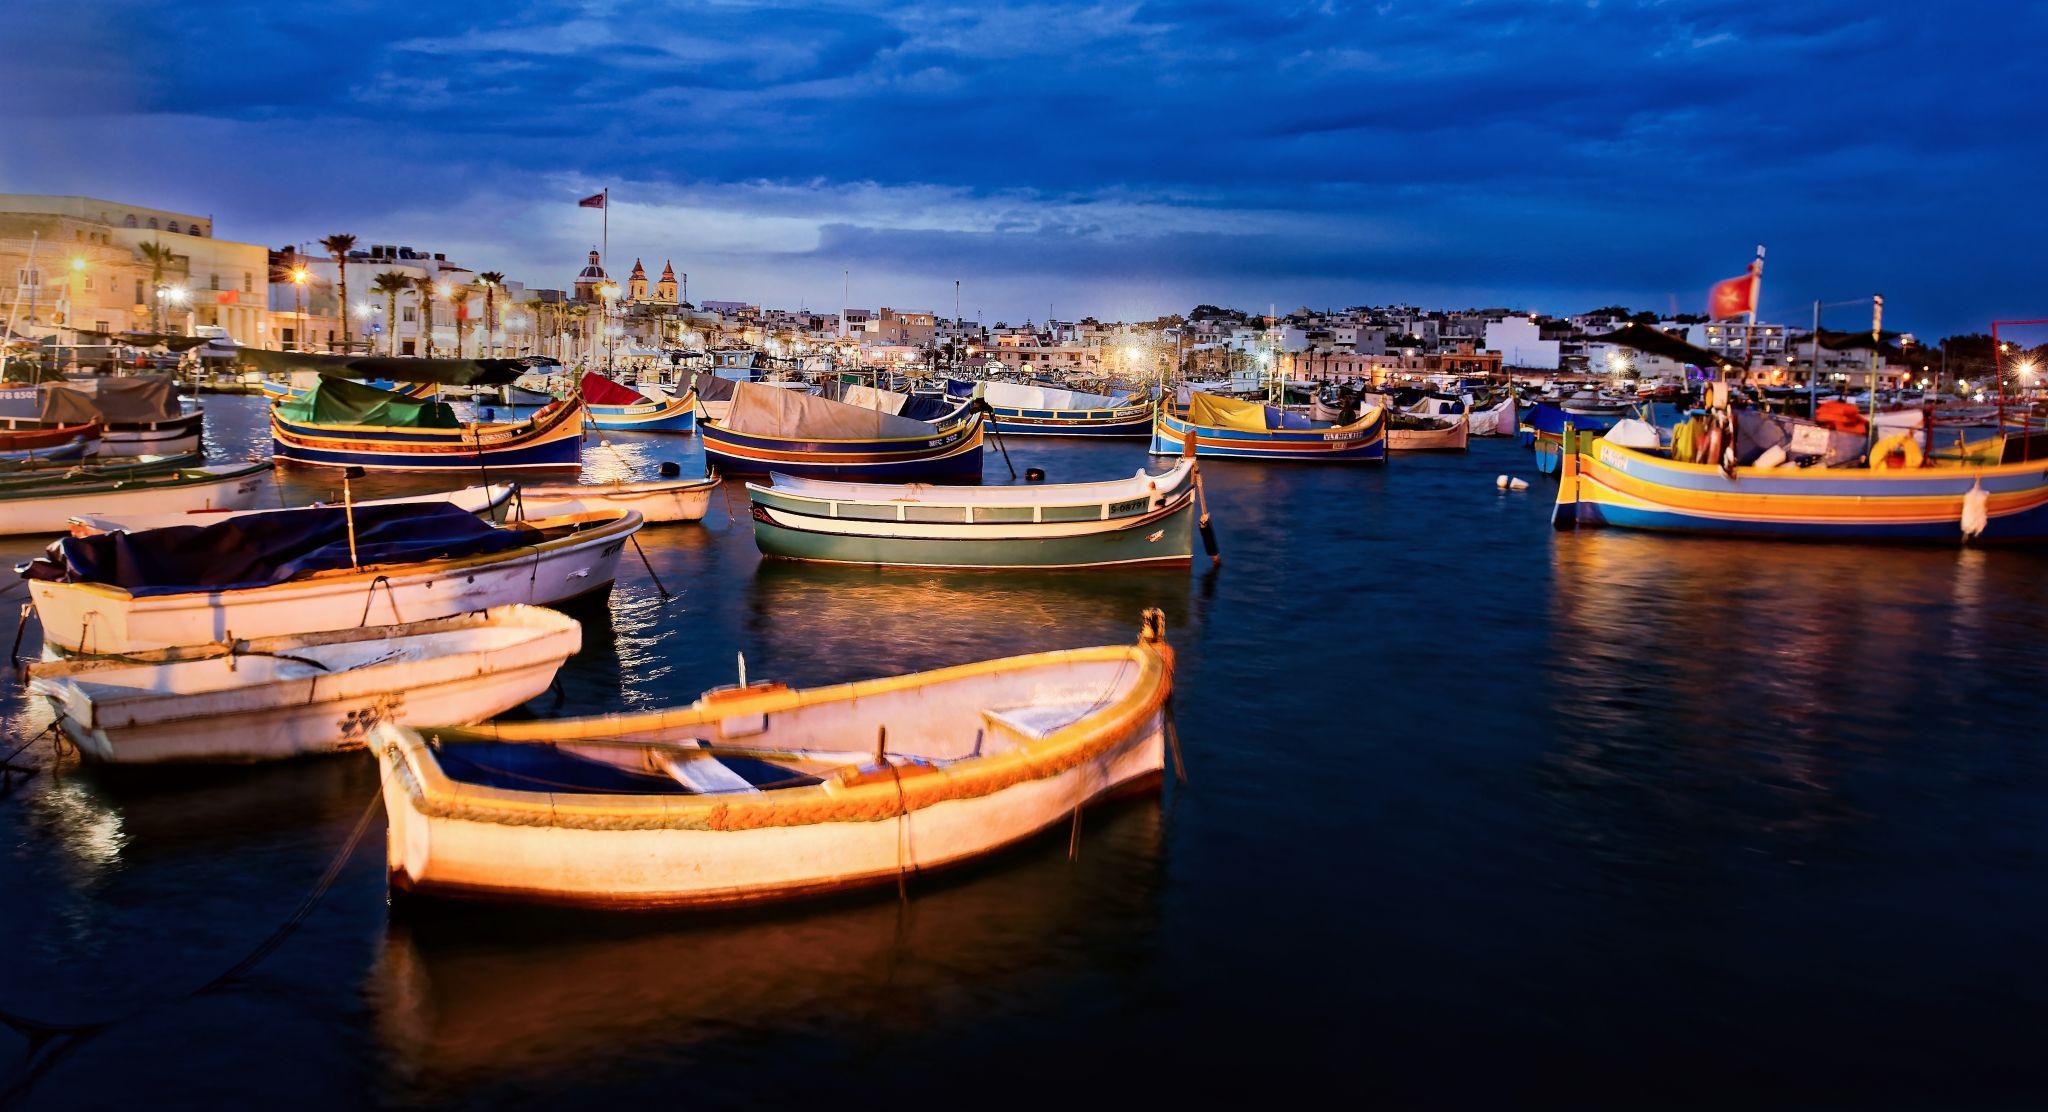 Harbor Marsaxlokk, Malta